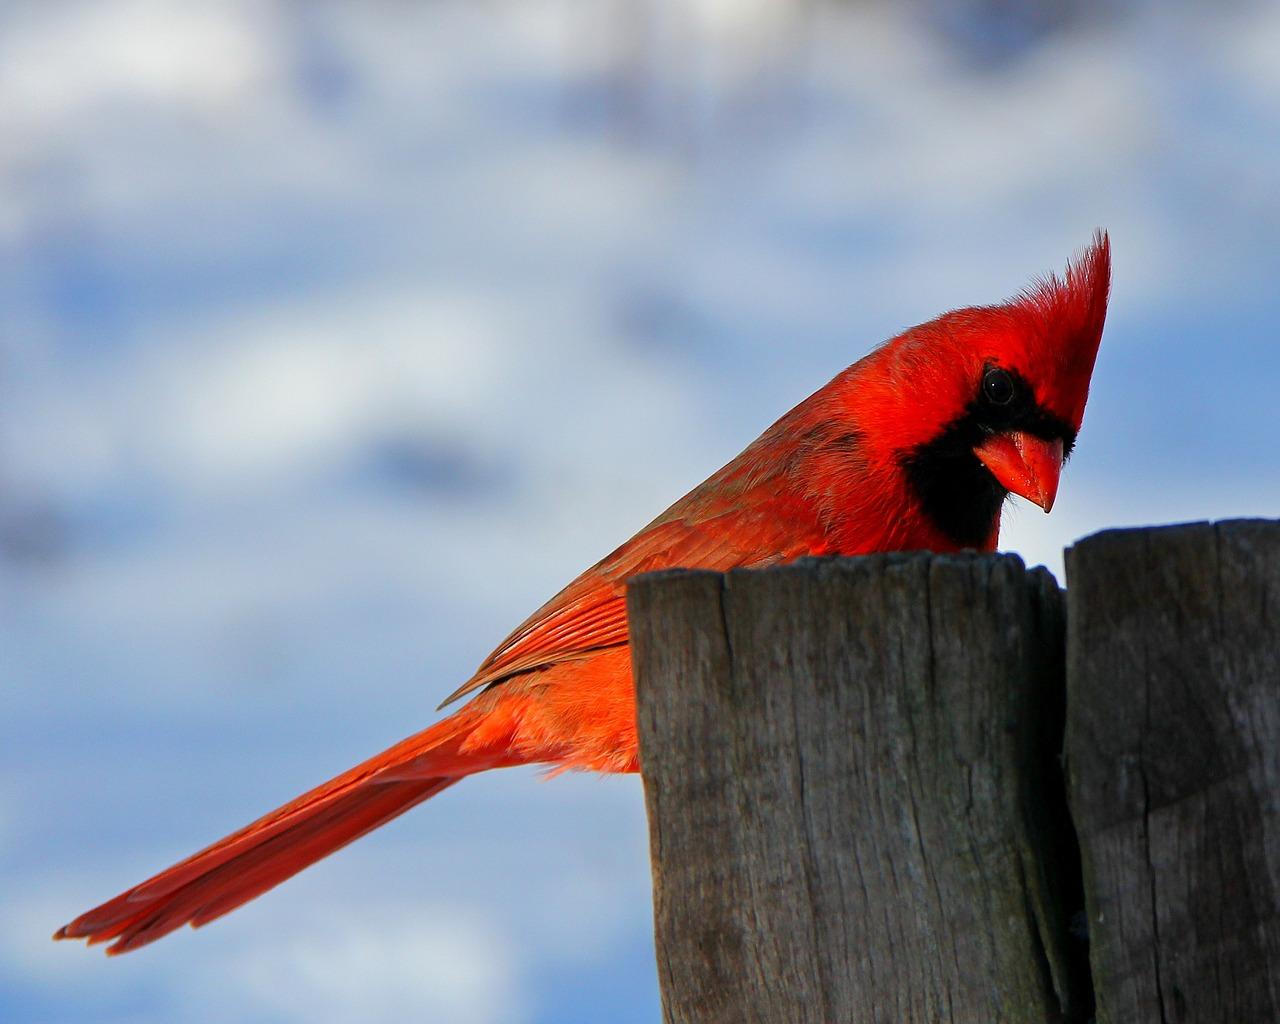 red bird-107802_1280